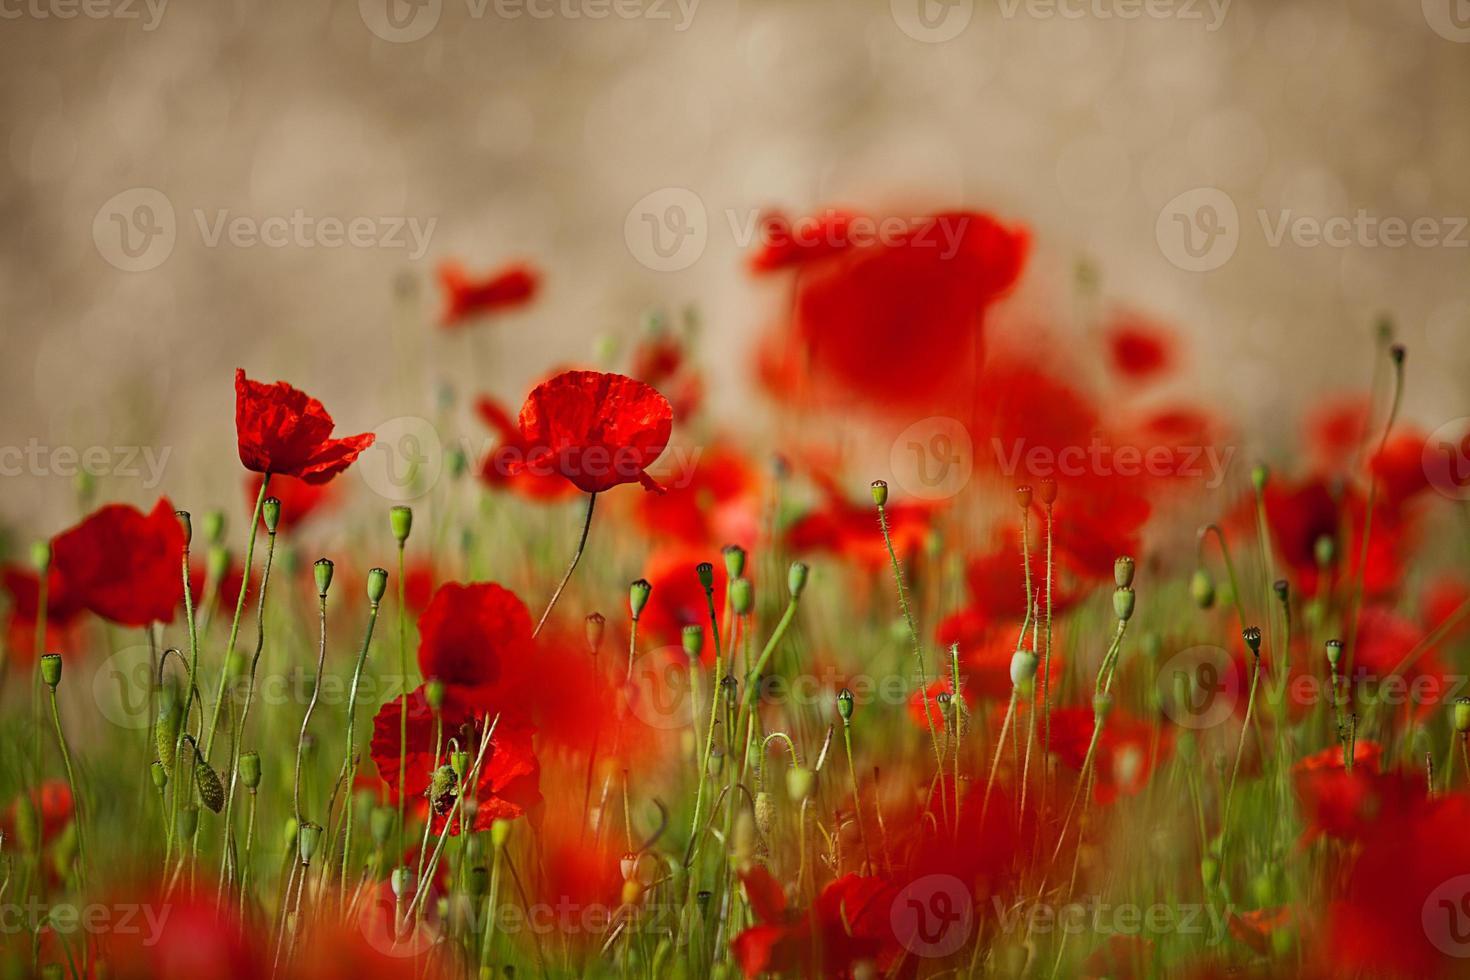 Red Corn Poppy Flowers photo